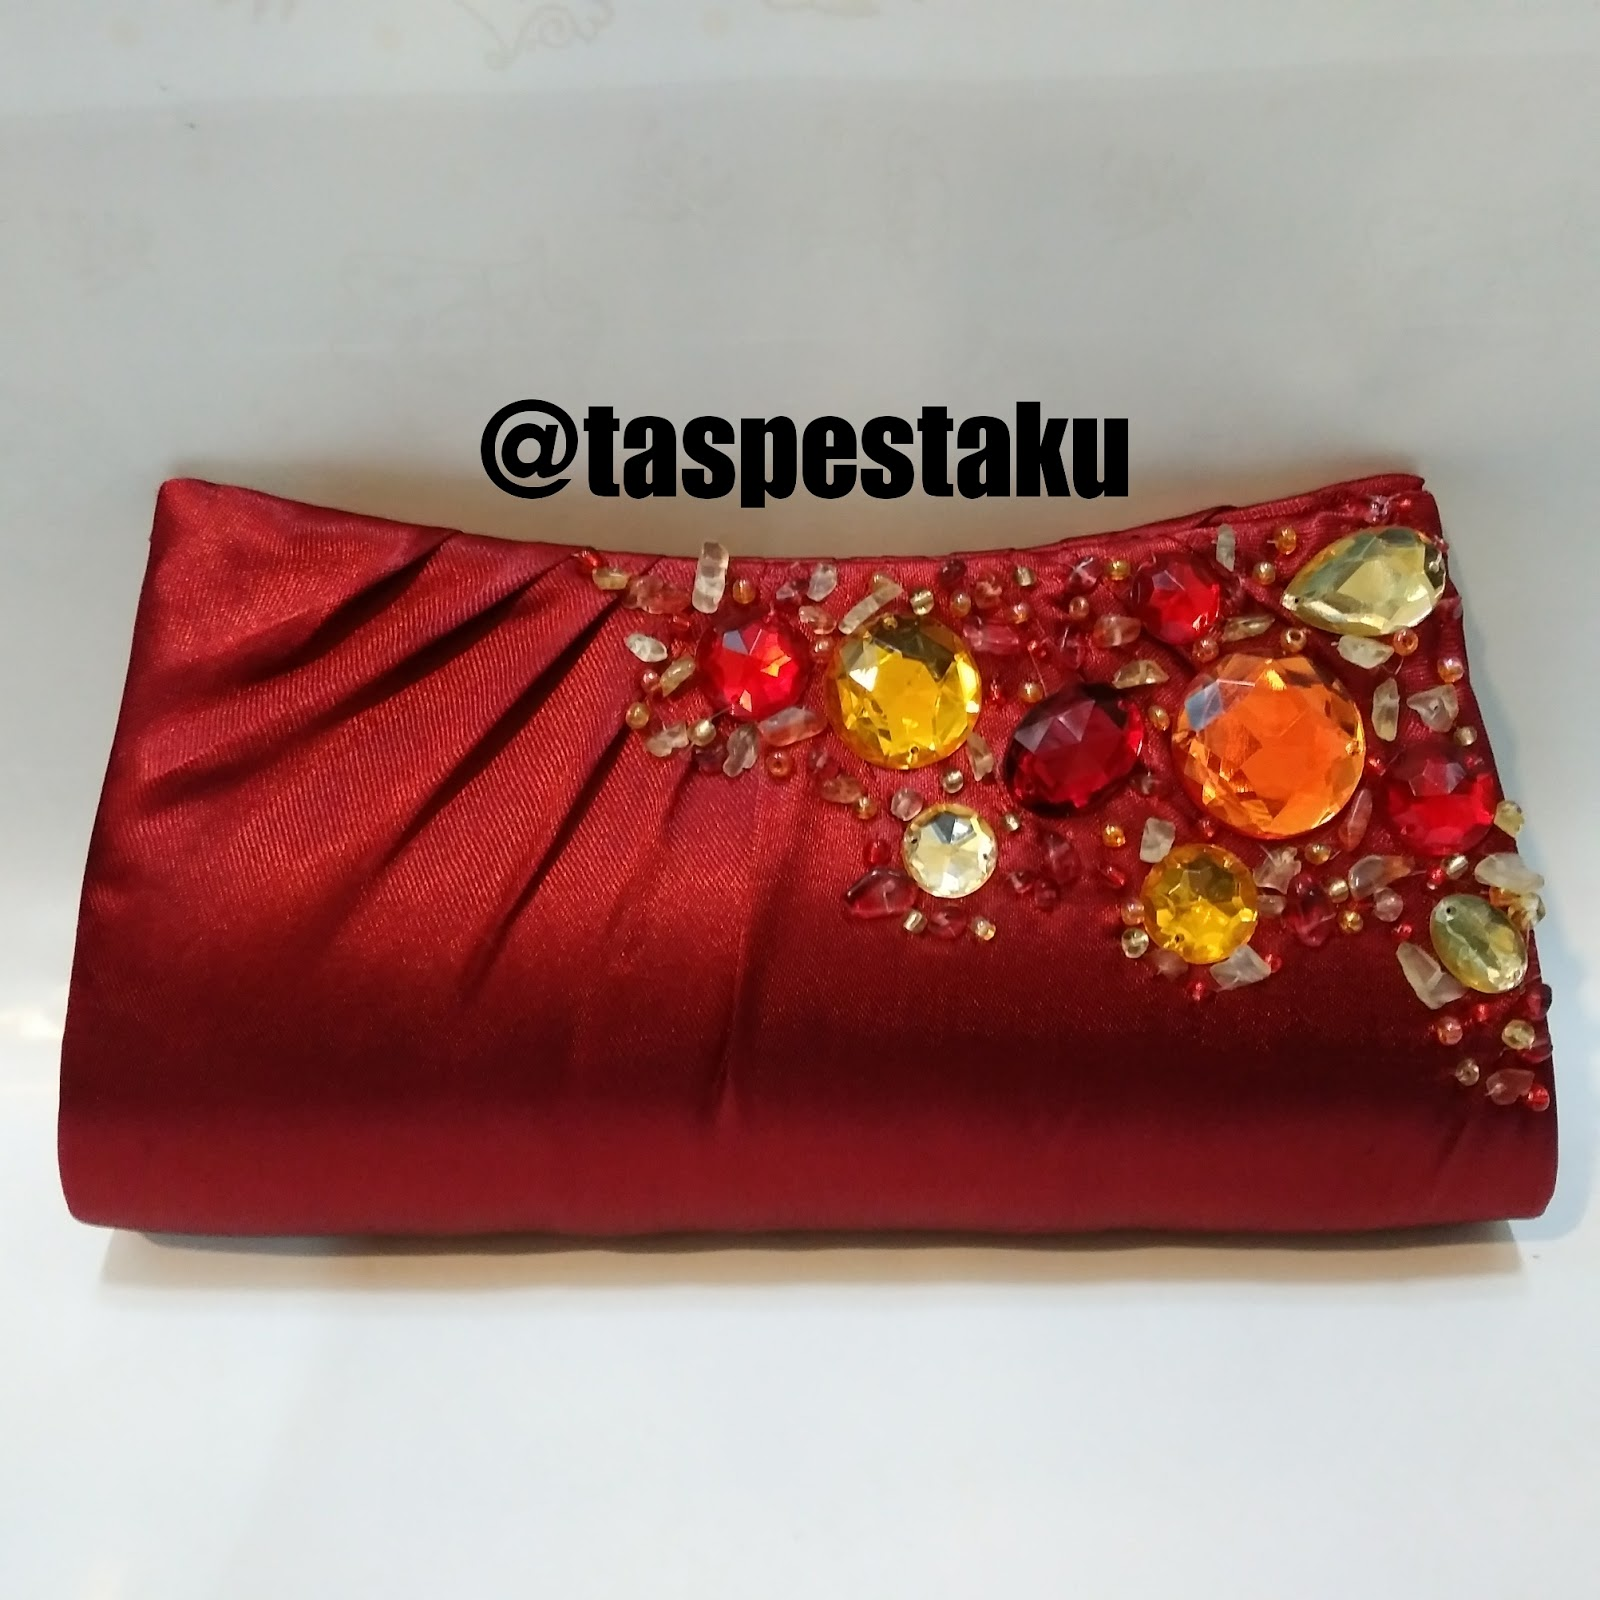 Tas Pesta Clutch Bag Taspestaku Merah Maroon Koleksi Ku